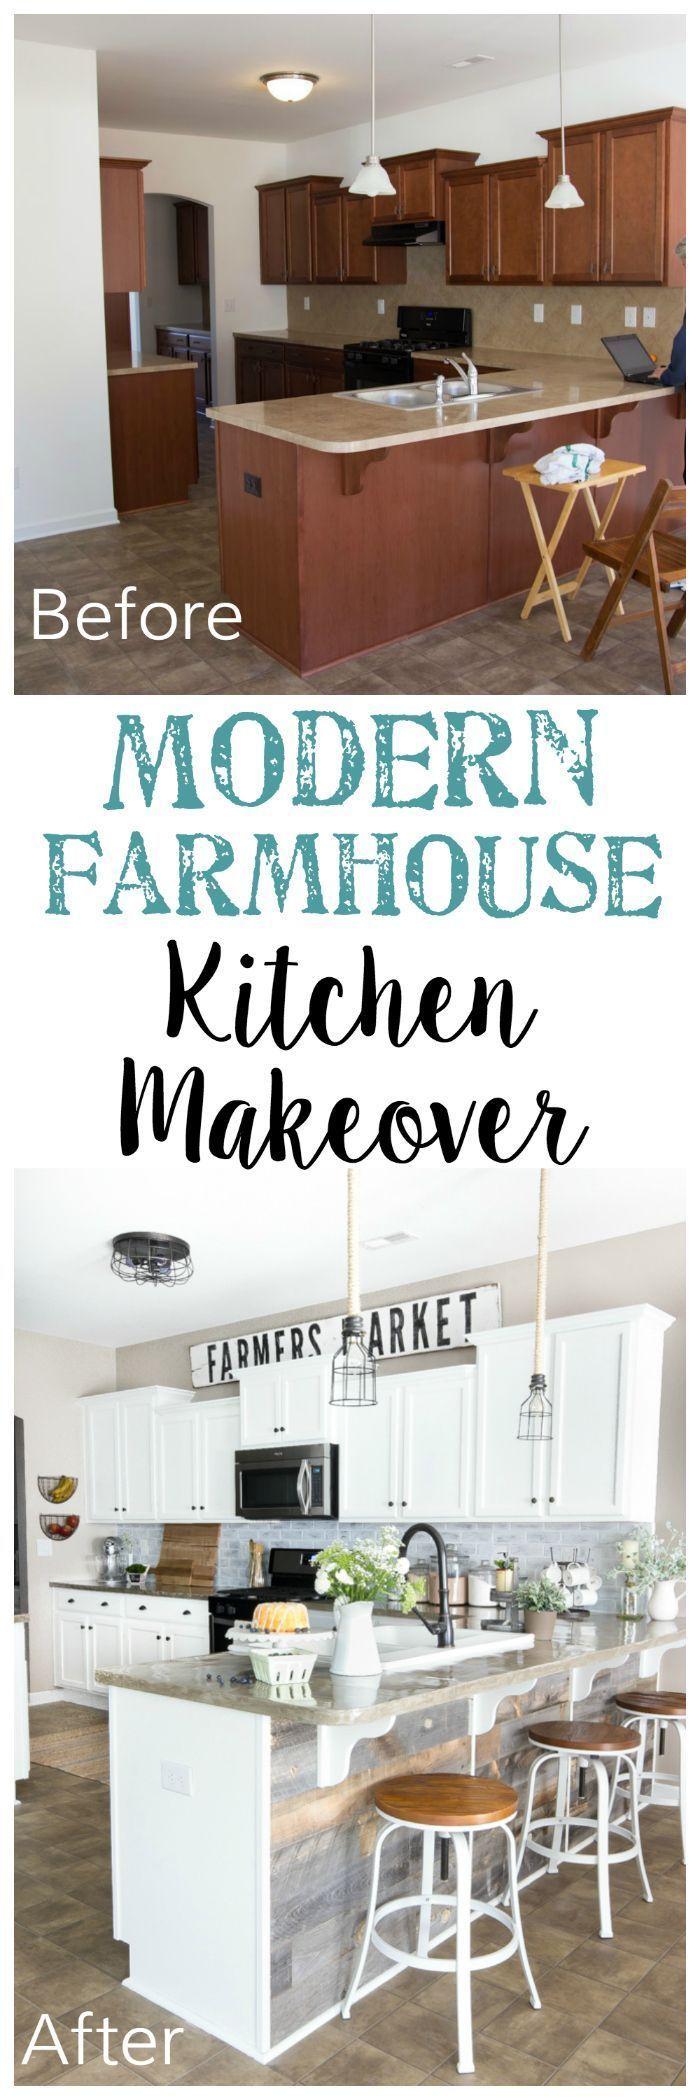 Ideas minday 1 modern farmhouse decorating - Modern Farmhouse Kitchen Makeover Reveal Http Blesserhouse Com So Many